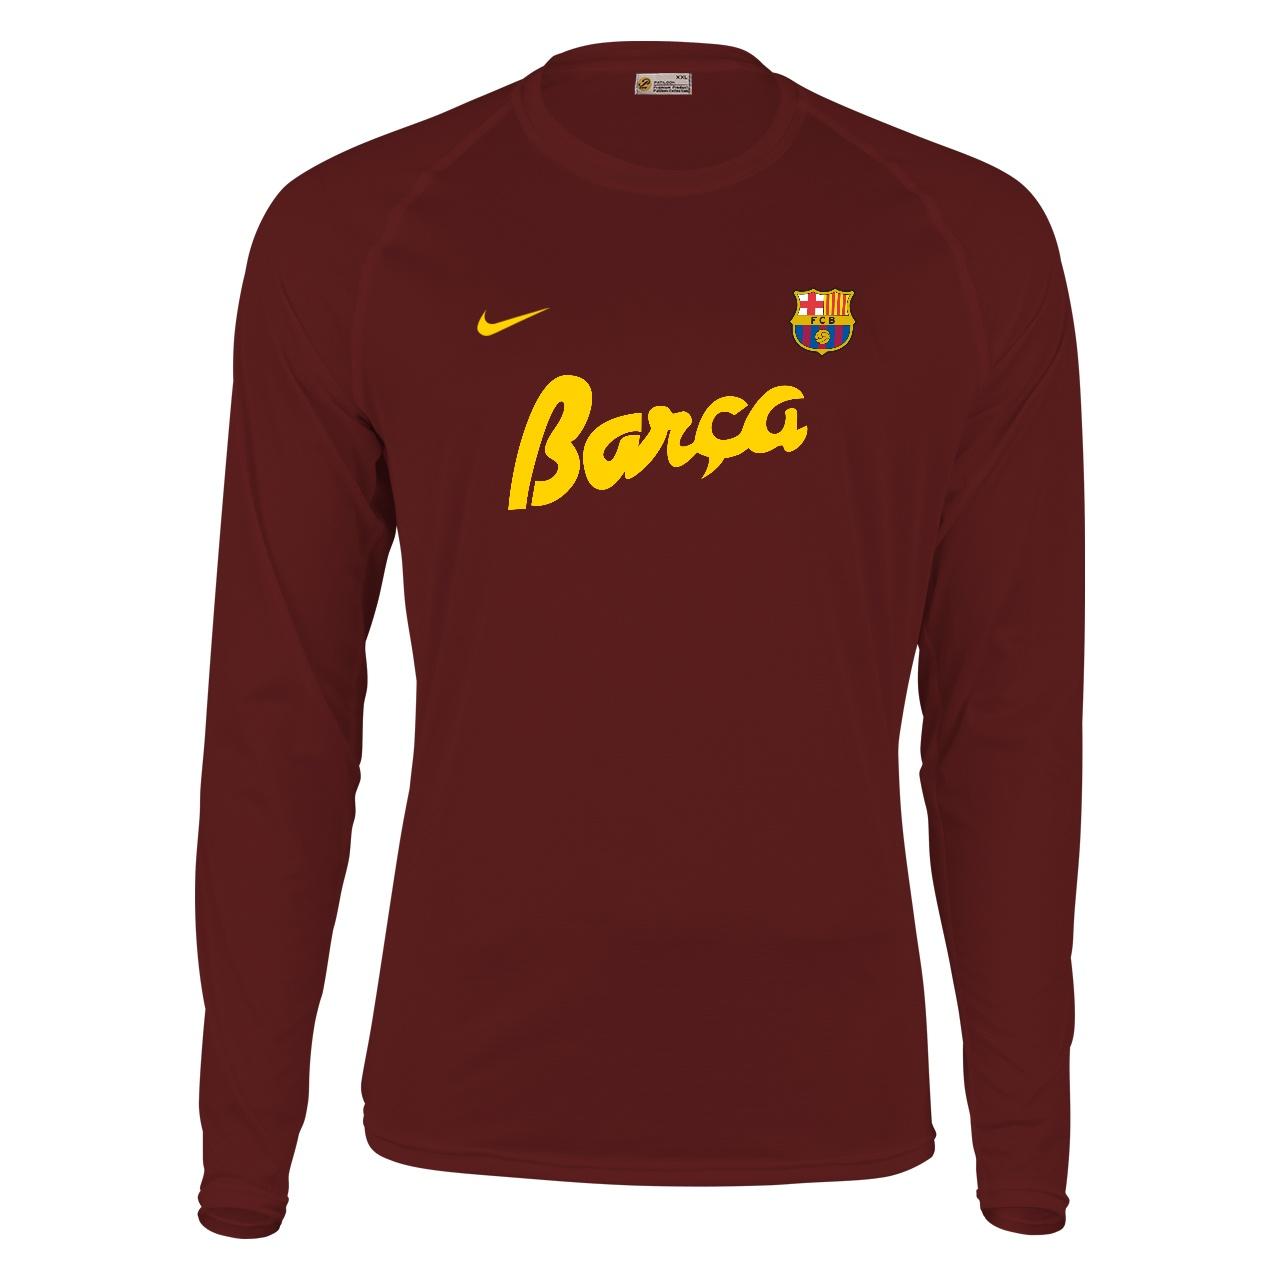 تیشرت آستین بلند مردانه طرح بارسلونا کد 330750